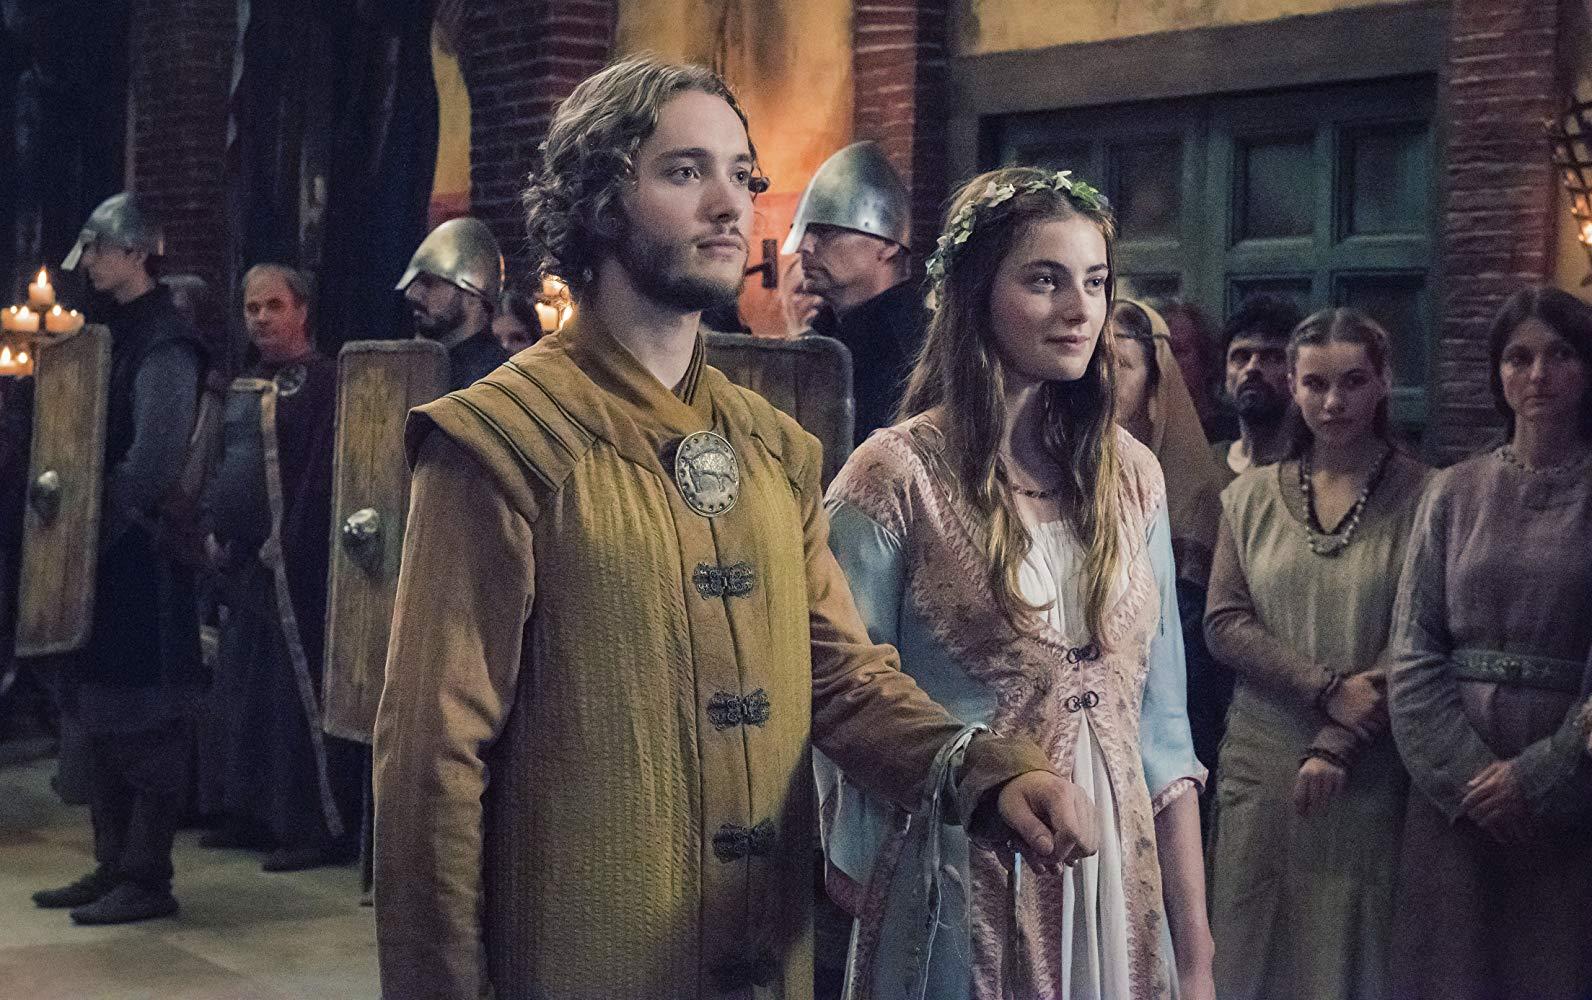 Toby Regbo and Millie Brady in The Last Kingdom.